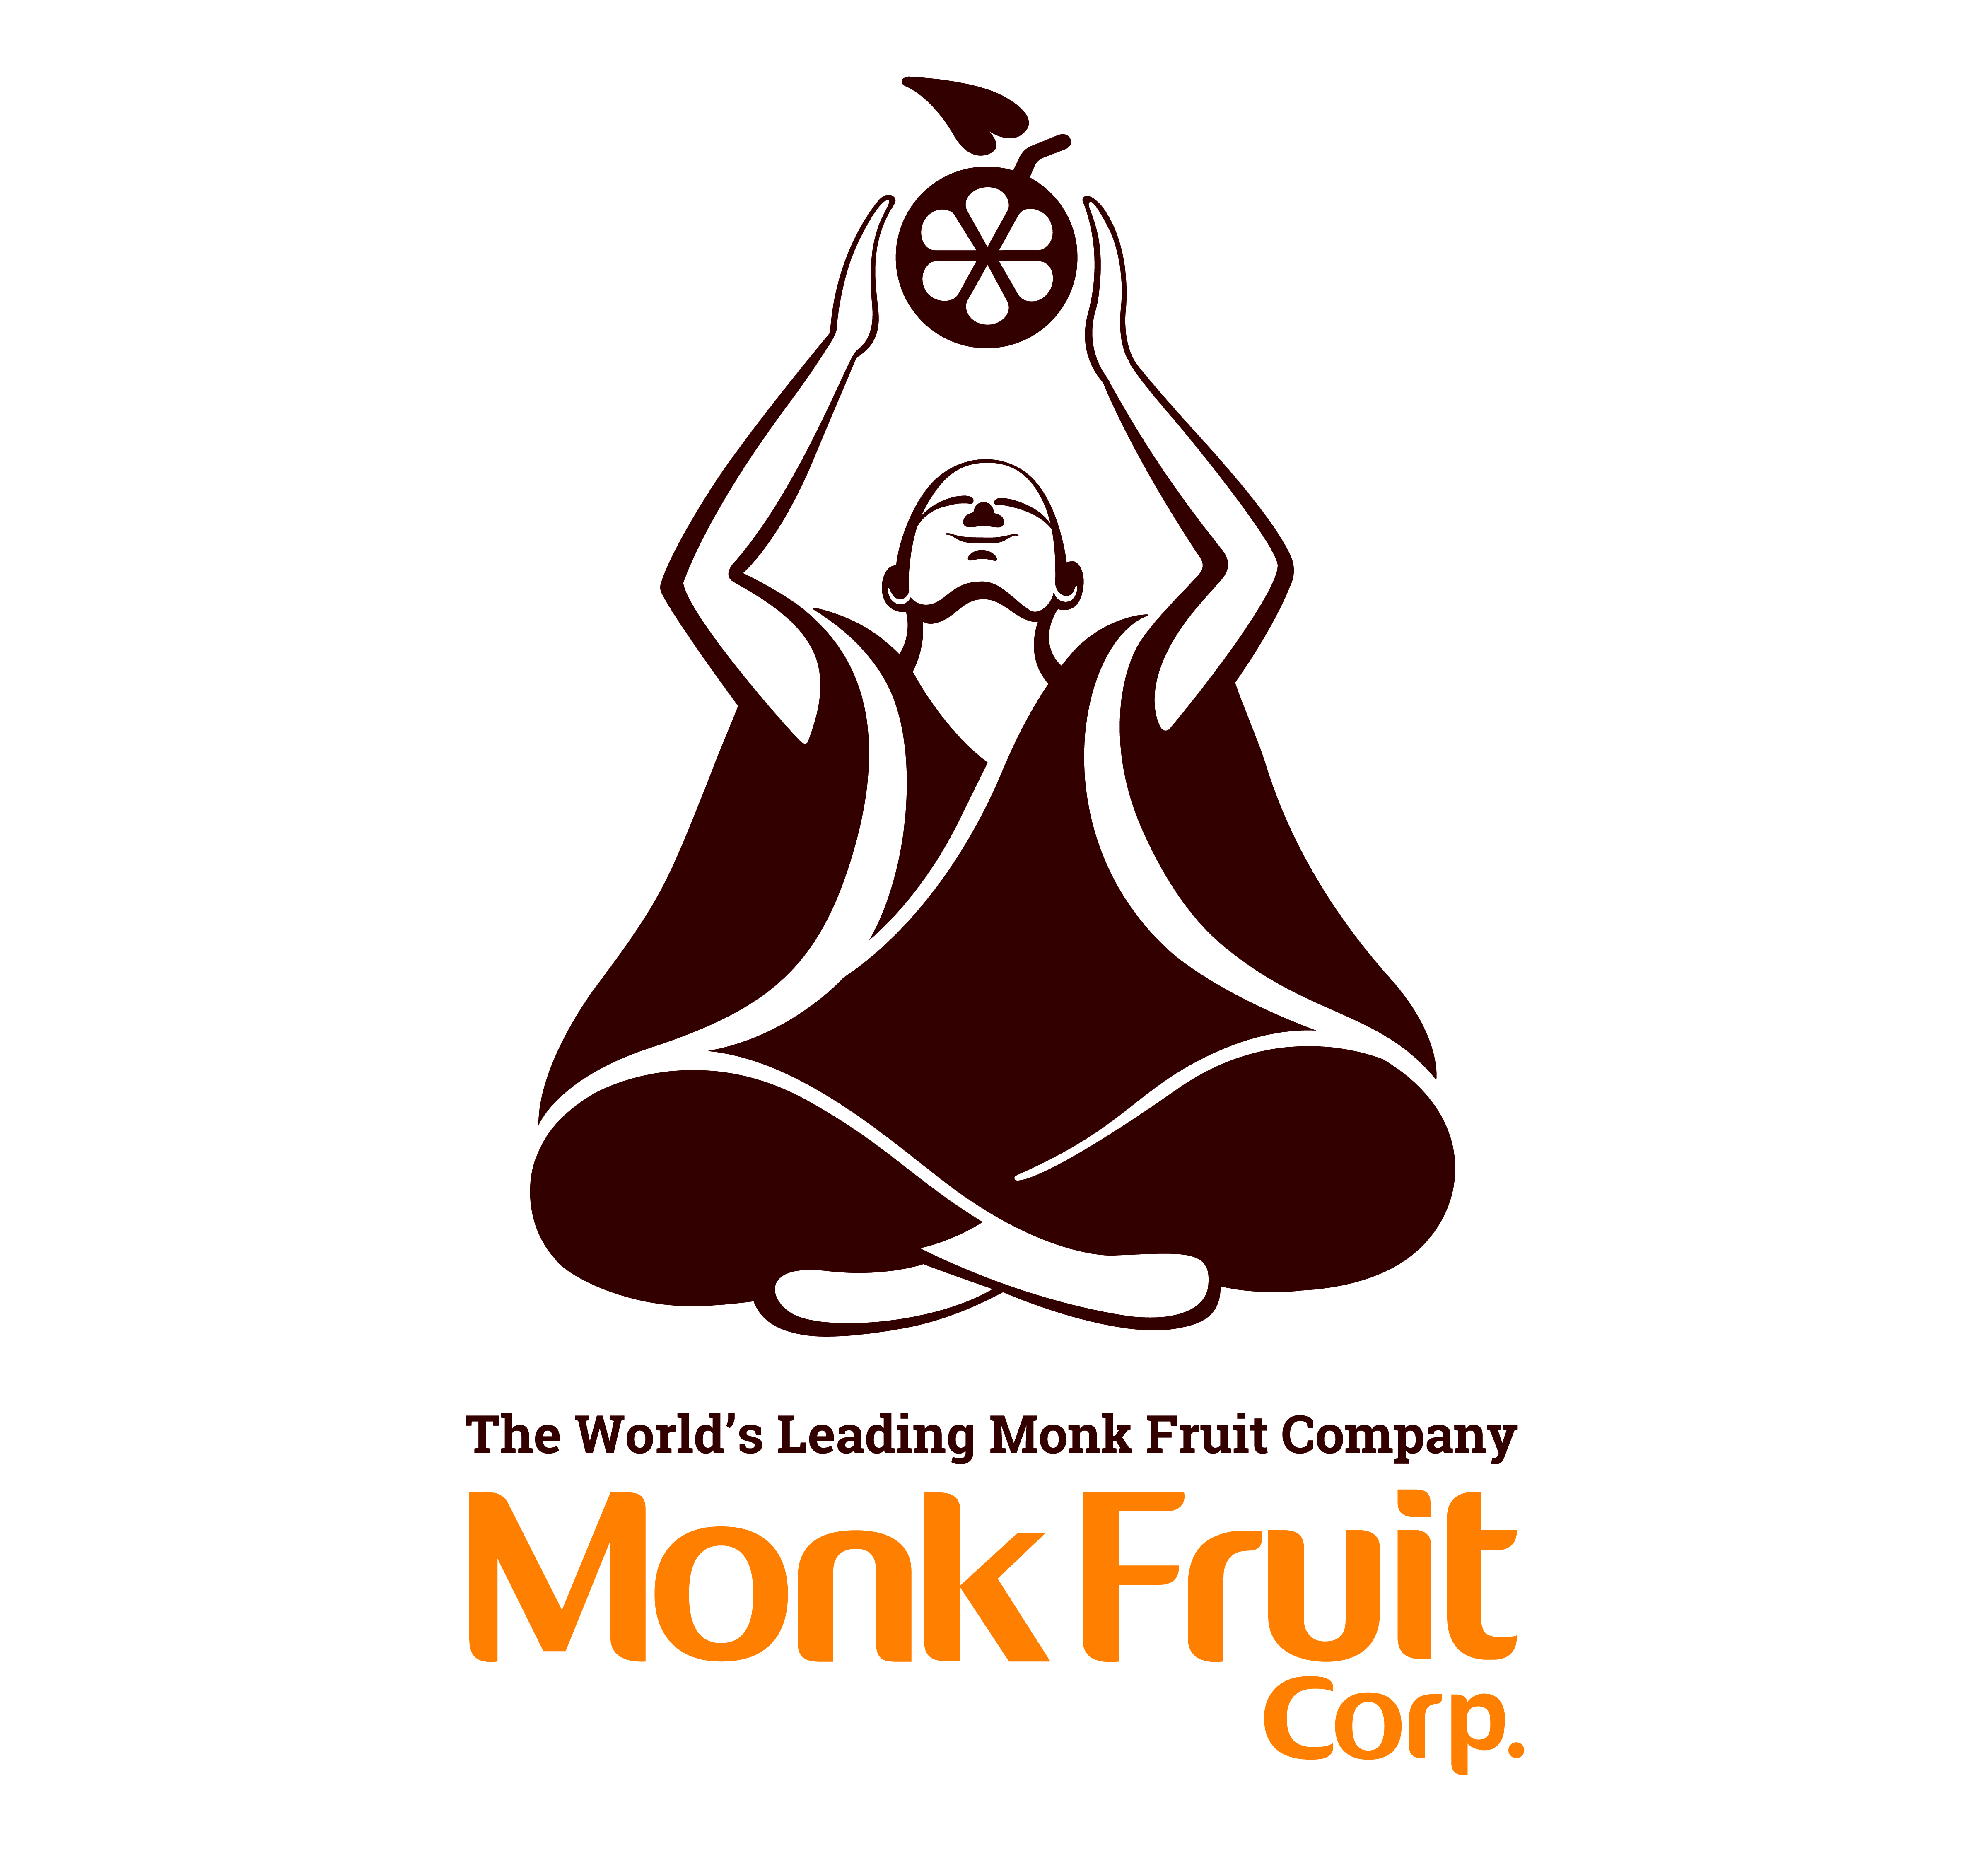 Monk Fruit Corp. - sponsoring BevNET Live Summer 2017